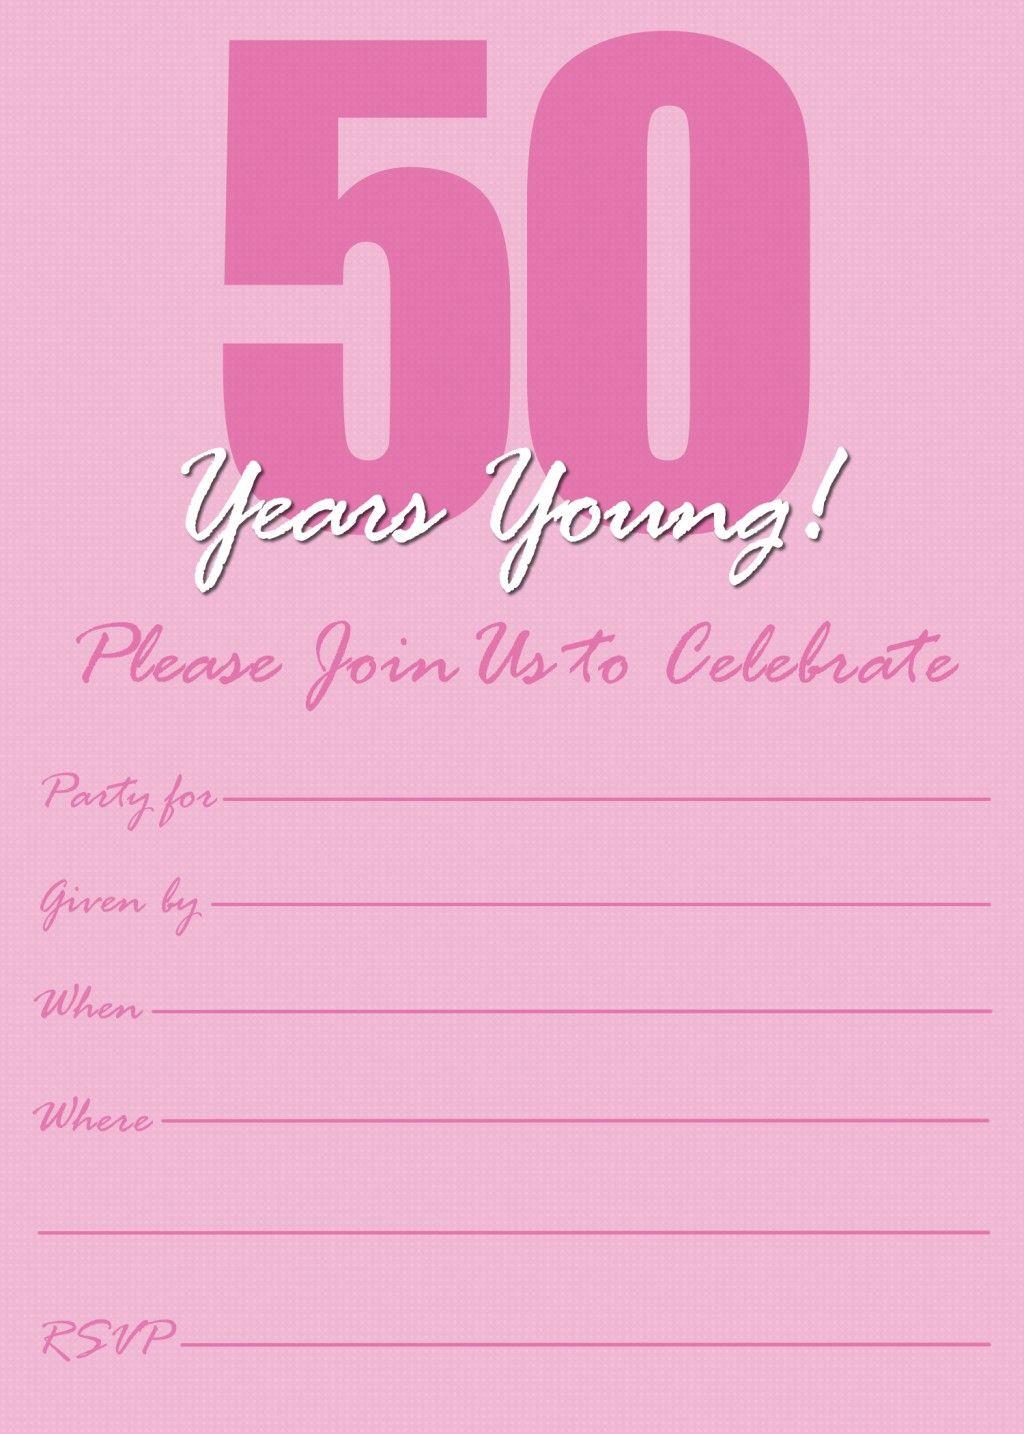 Free Printable 50th Birthday Party Invitations Templates ...